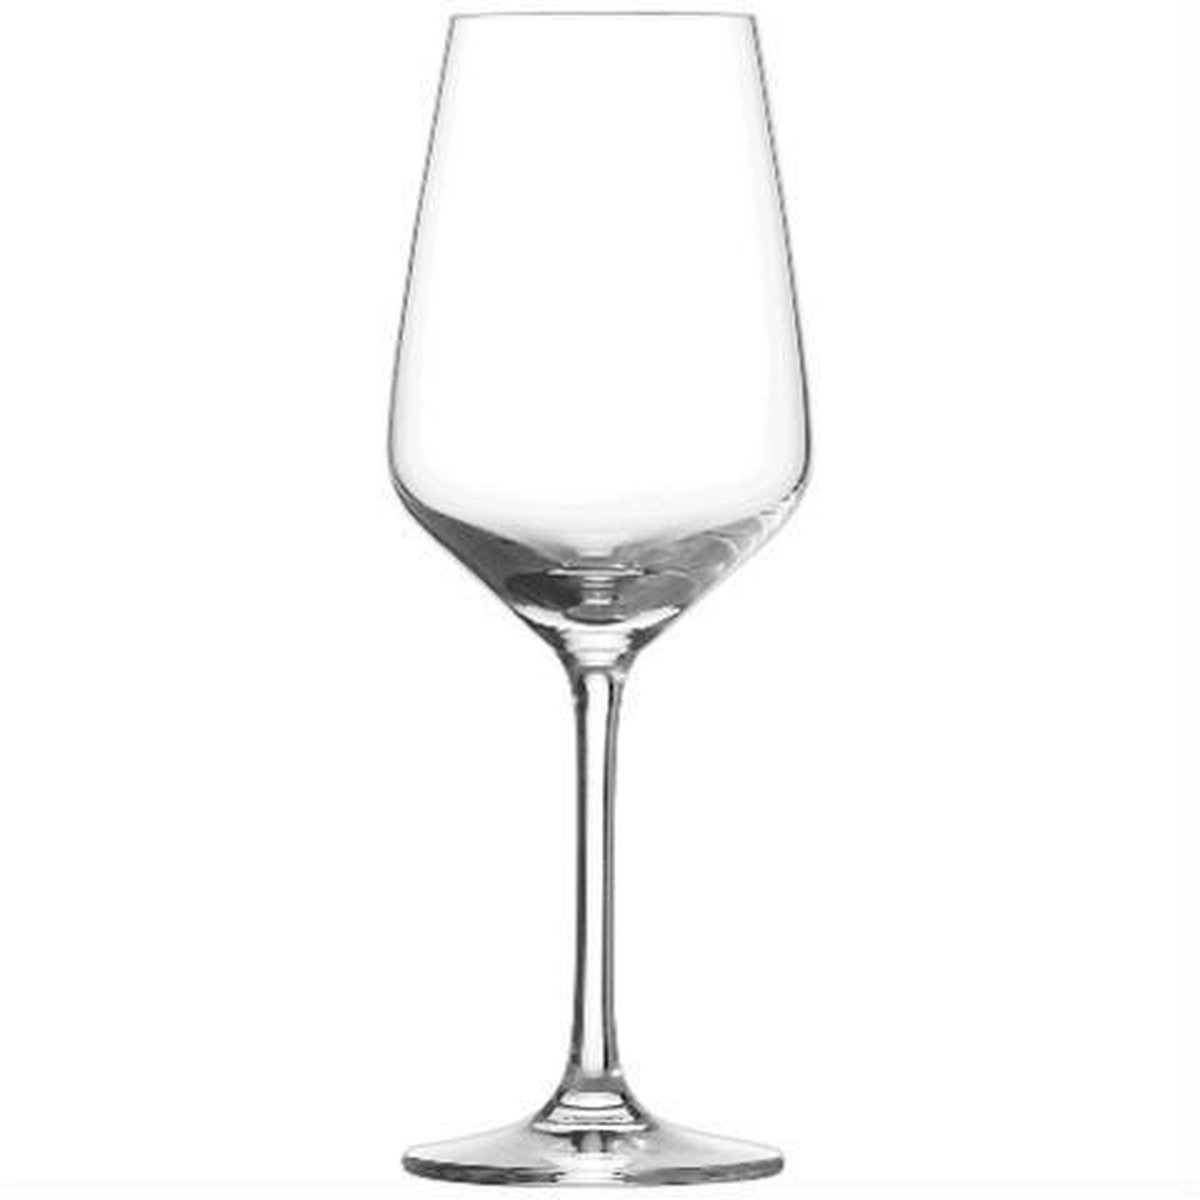 Schott Zwiesel Taste Witte wijnglas - 0.36 Ltr - 6 Stuks